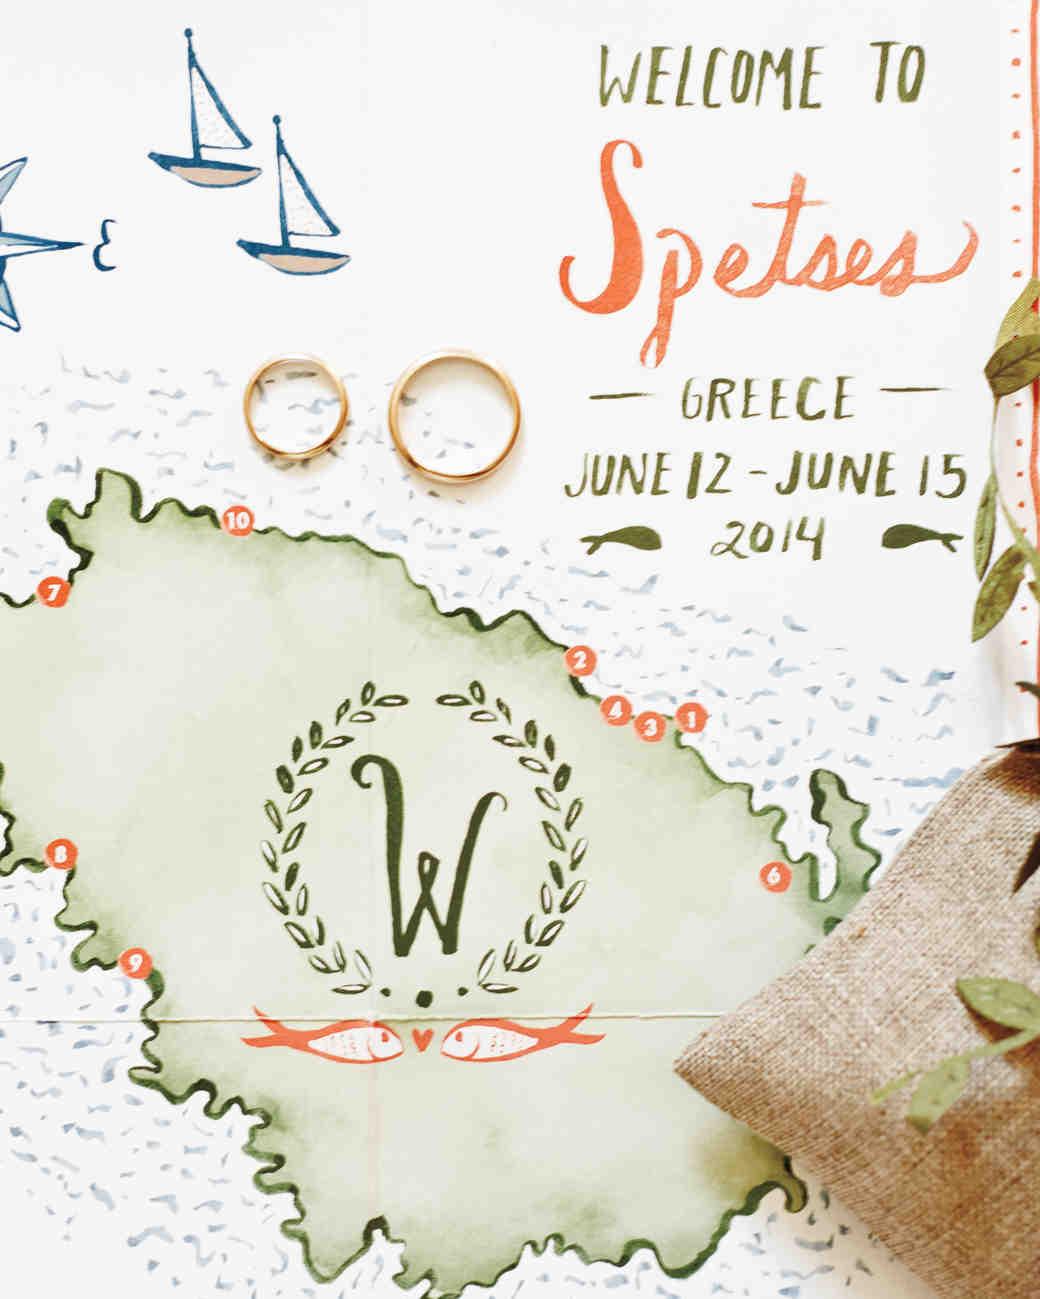 ana-alden-wedding-greece-611a3371-s111821.jpg